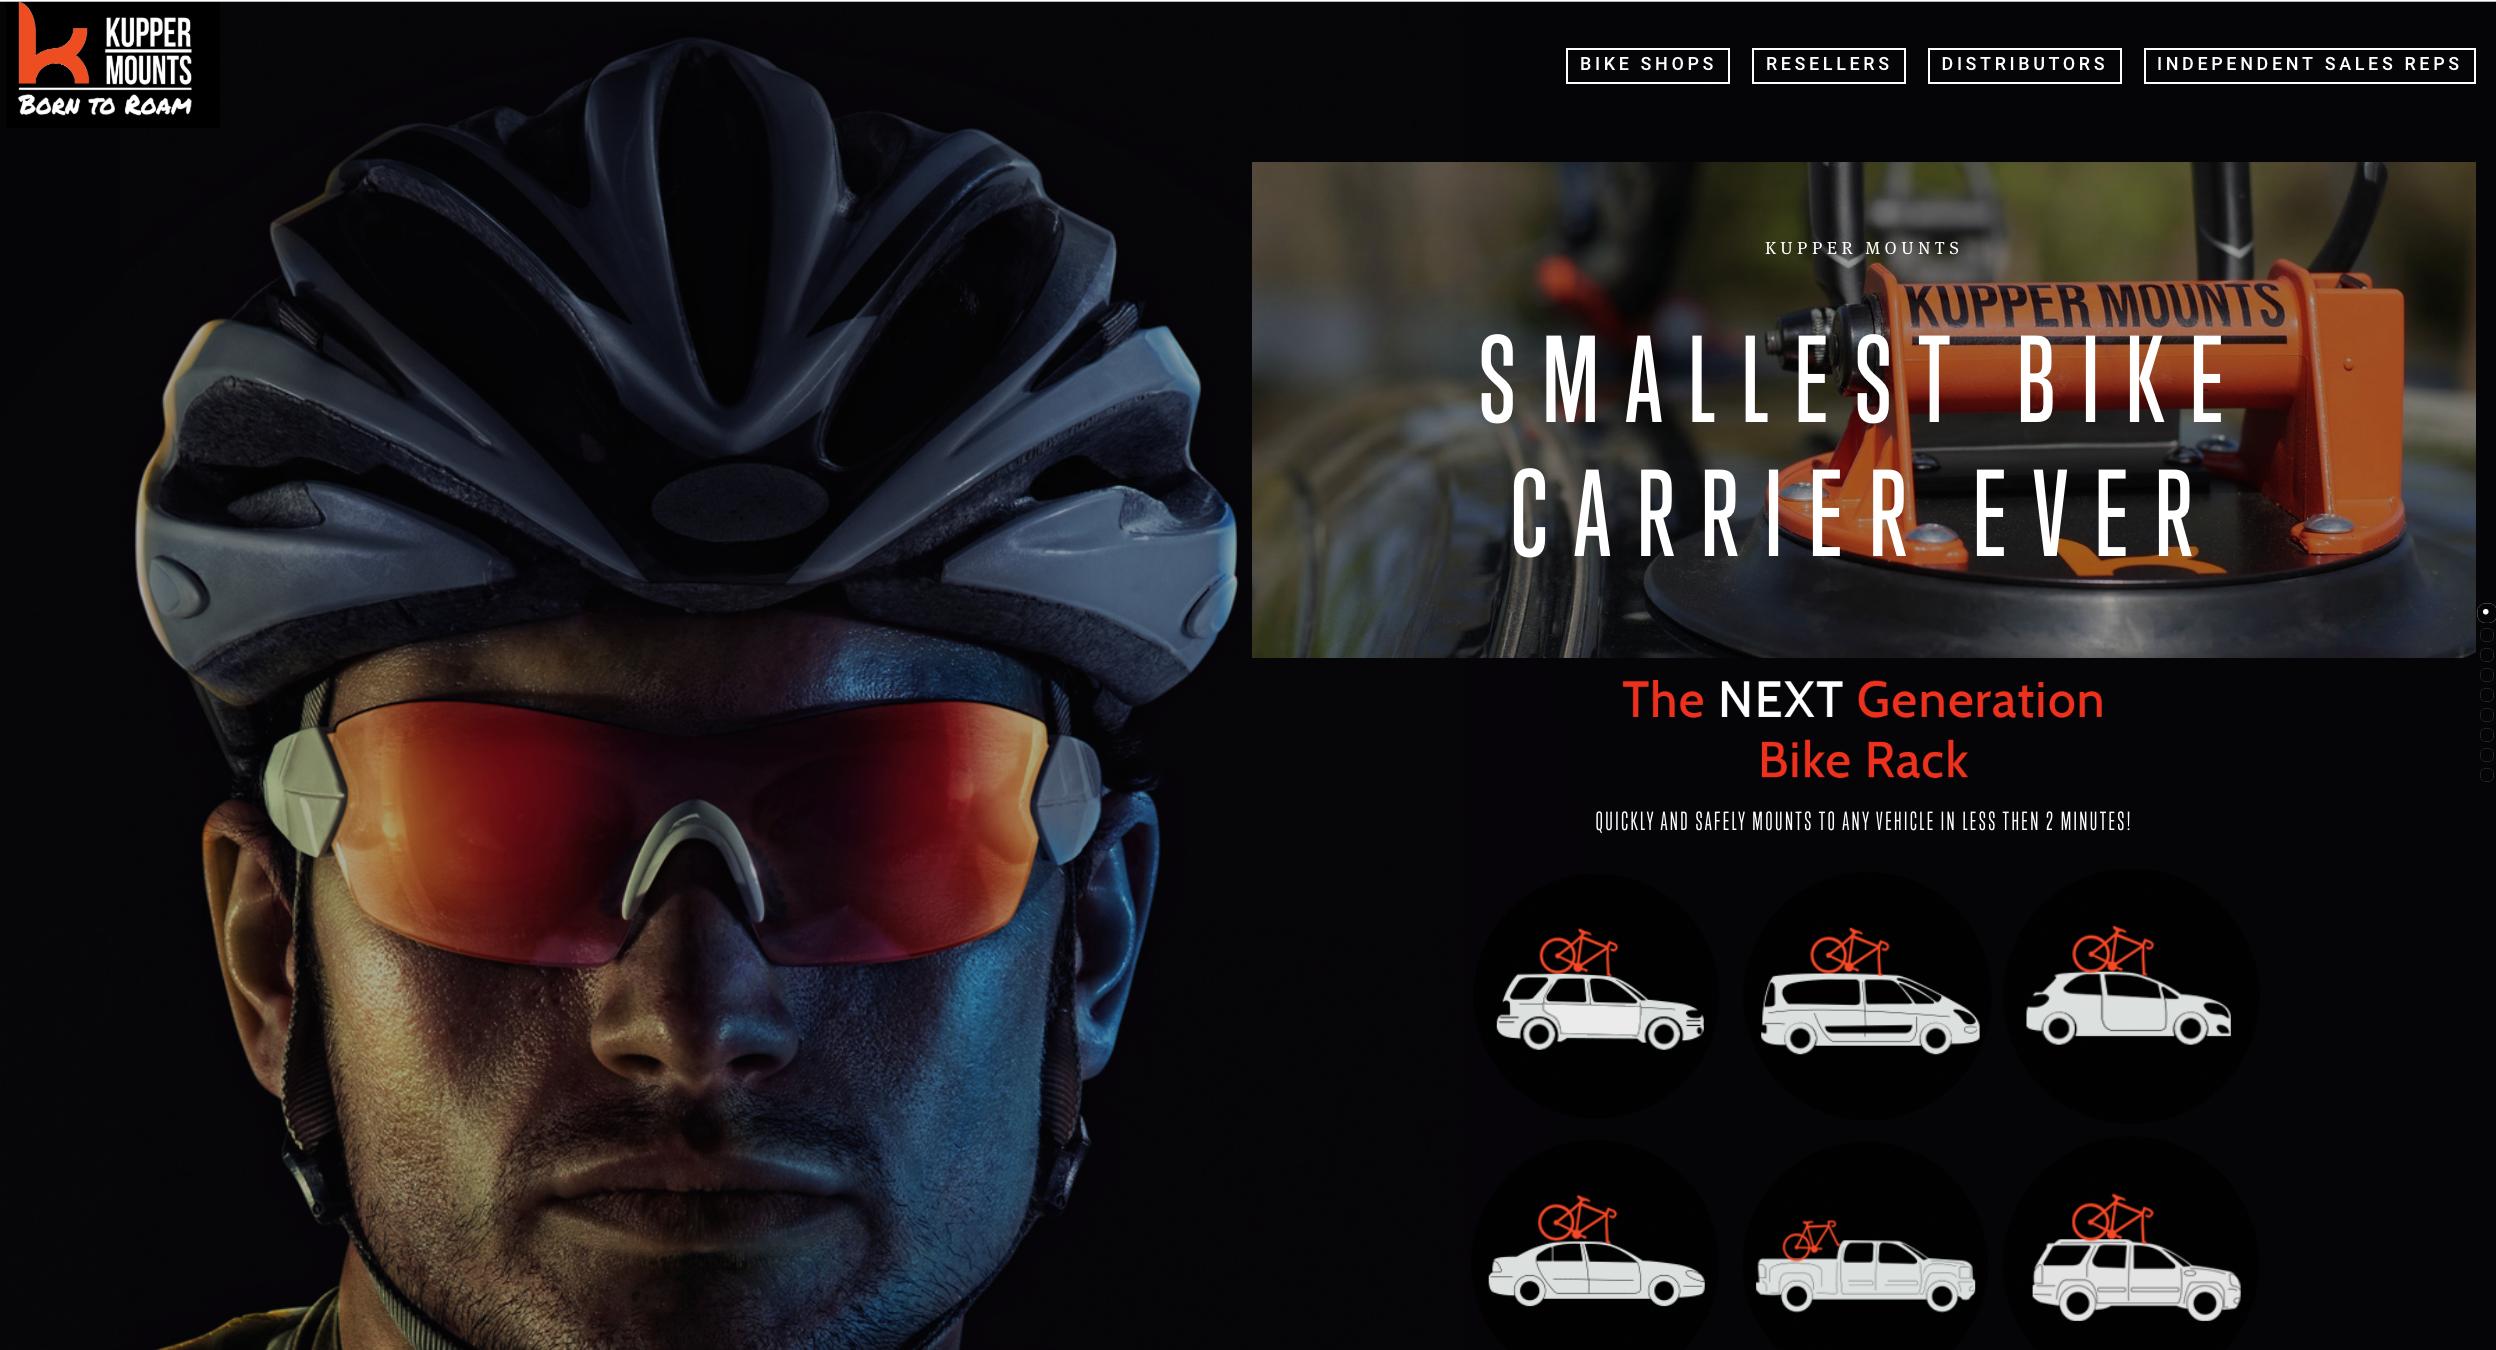 Kupper Mounts Black Bike Helmet.png